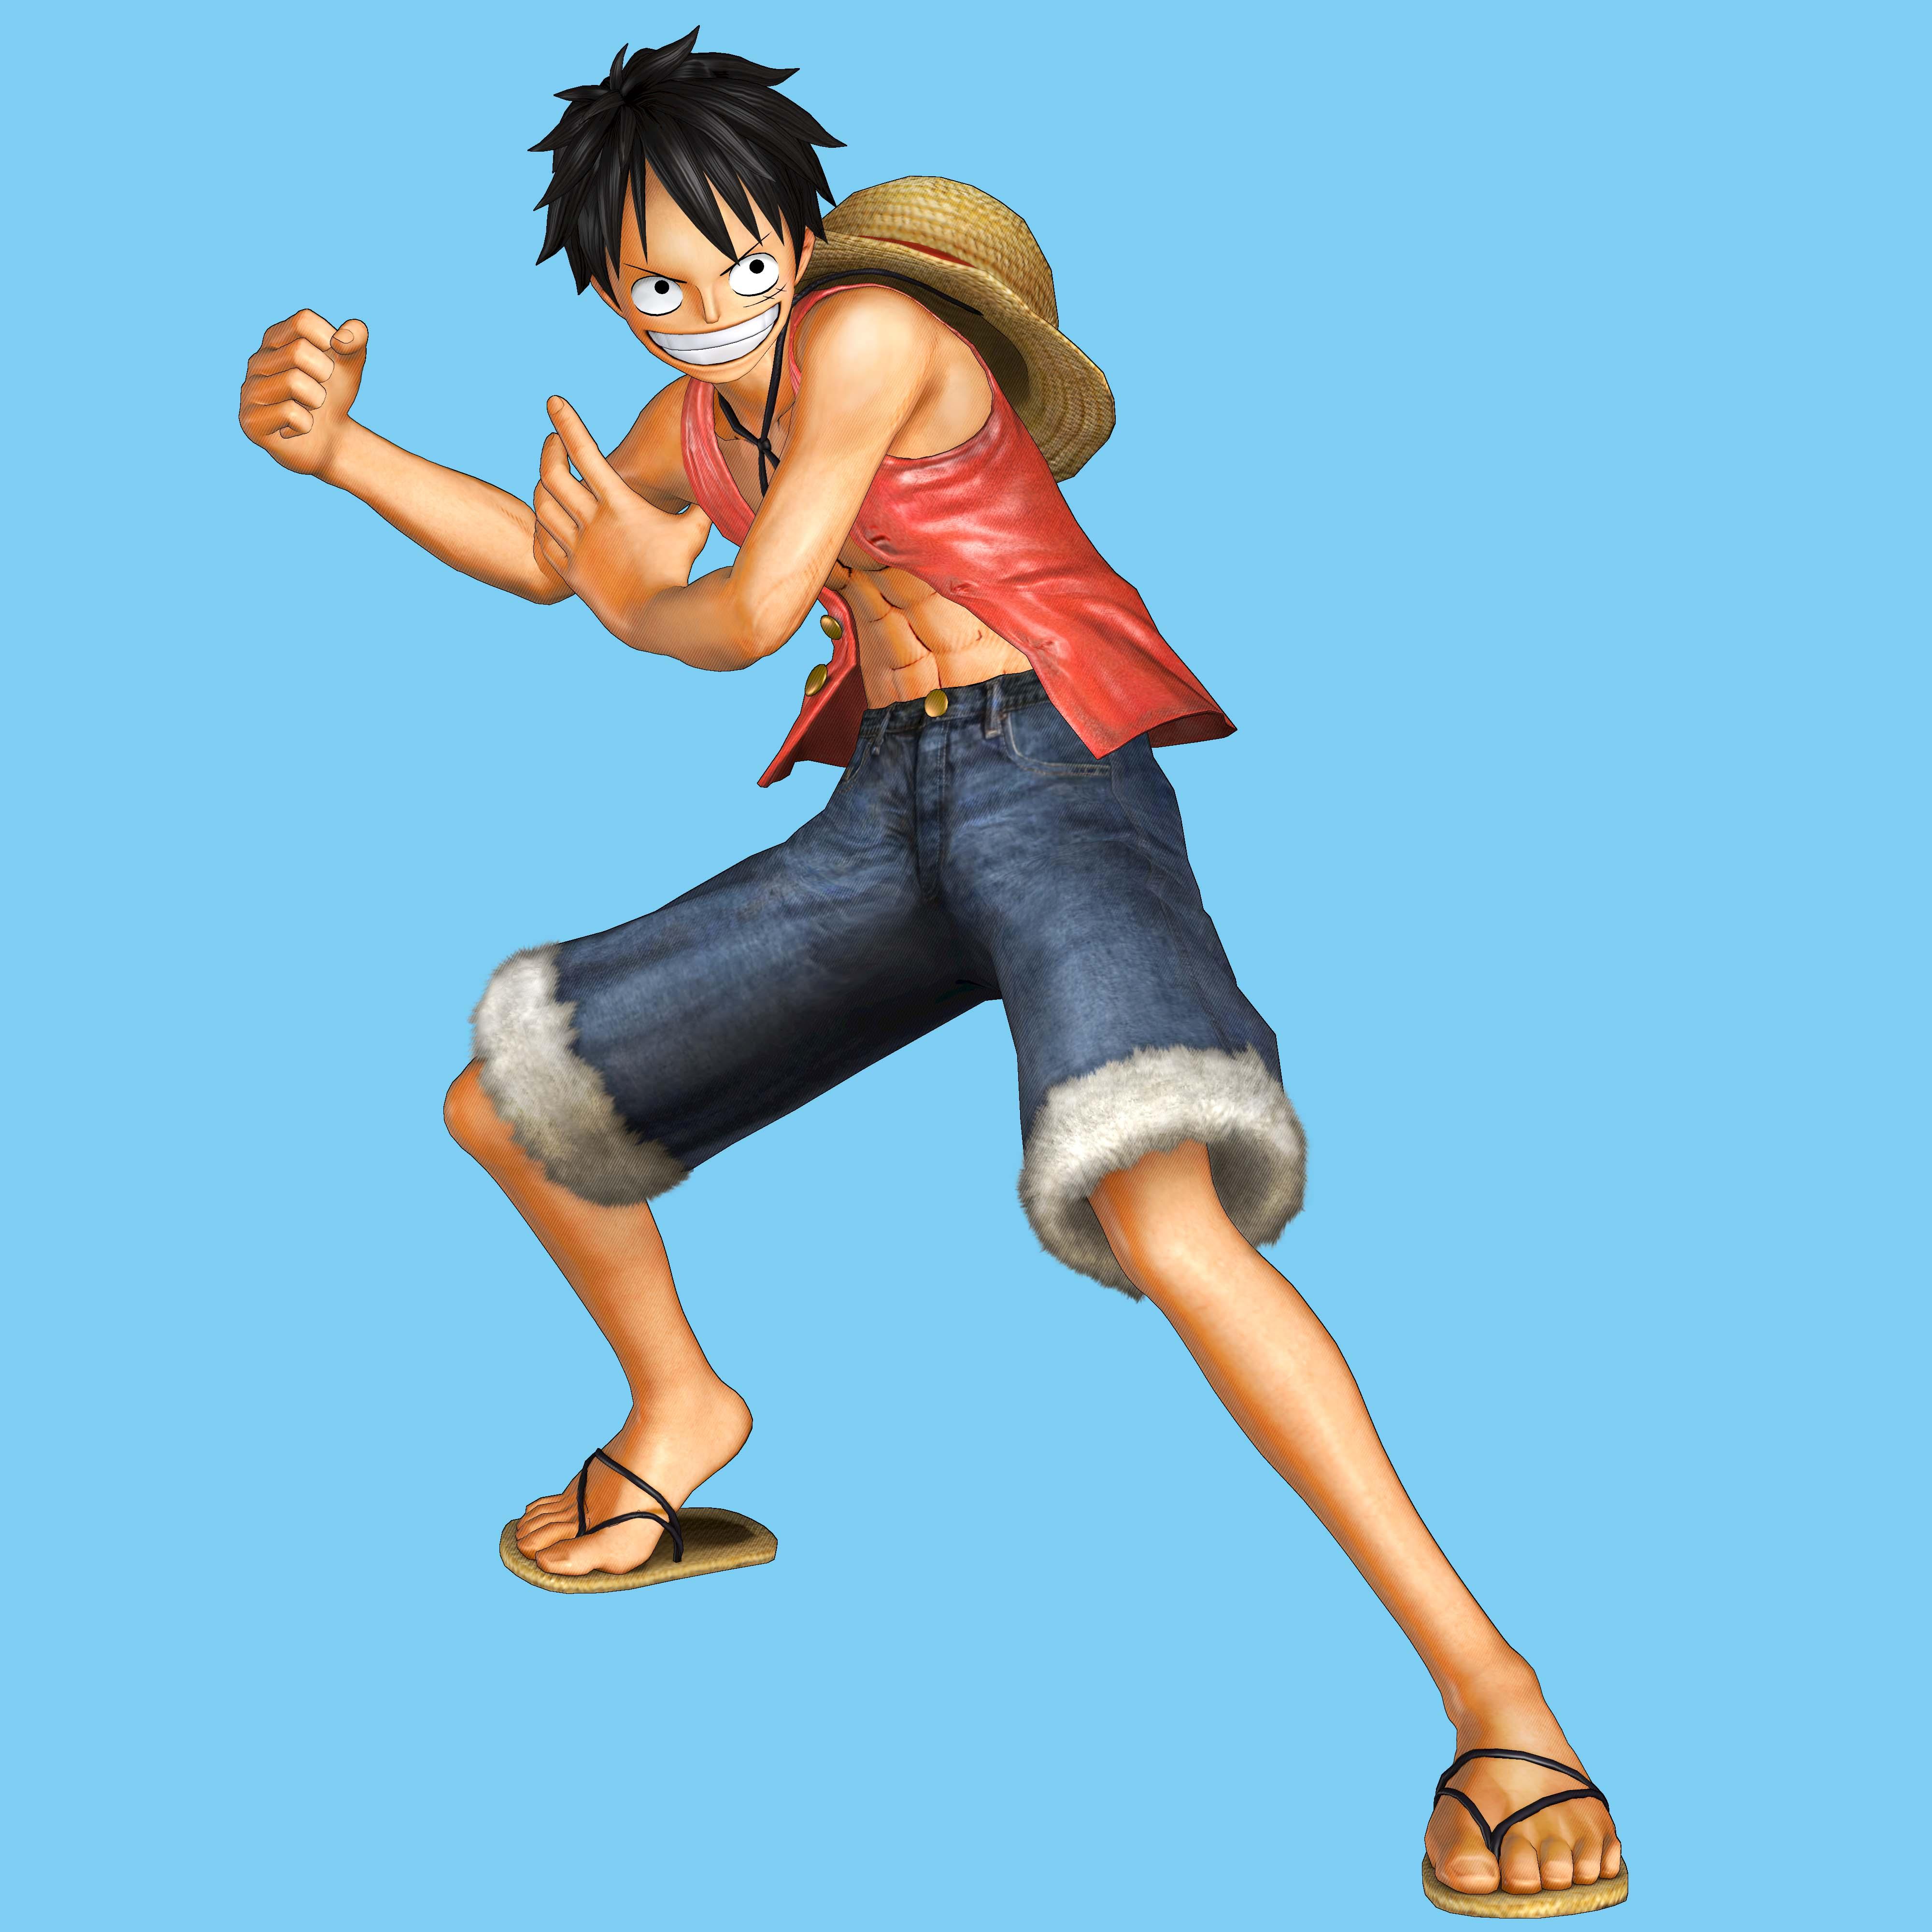 One Piece Pirate Warriors 2 Release Date Announced: A Feast Of New One Piece: Pirate Warriors Visuals